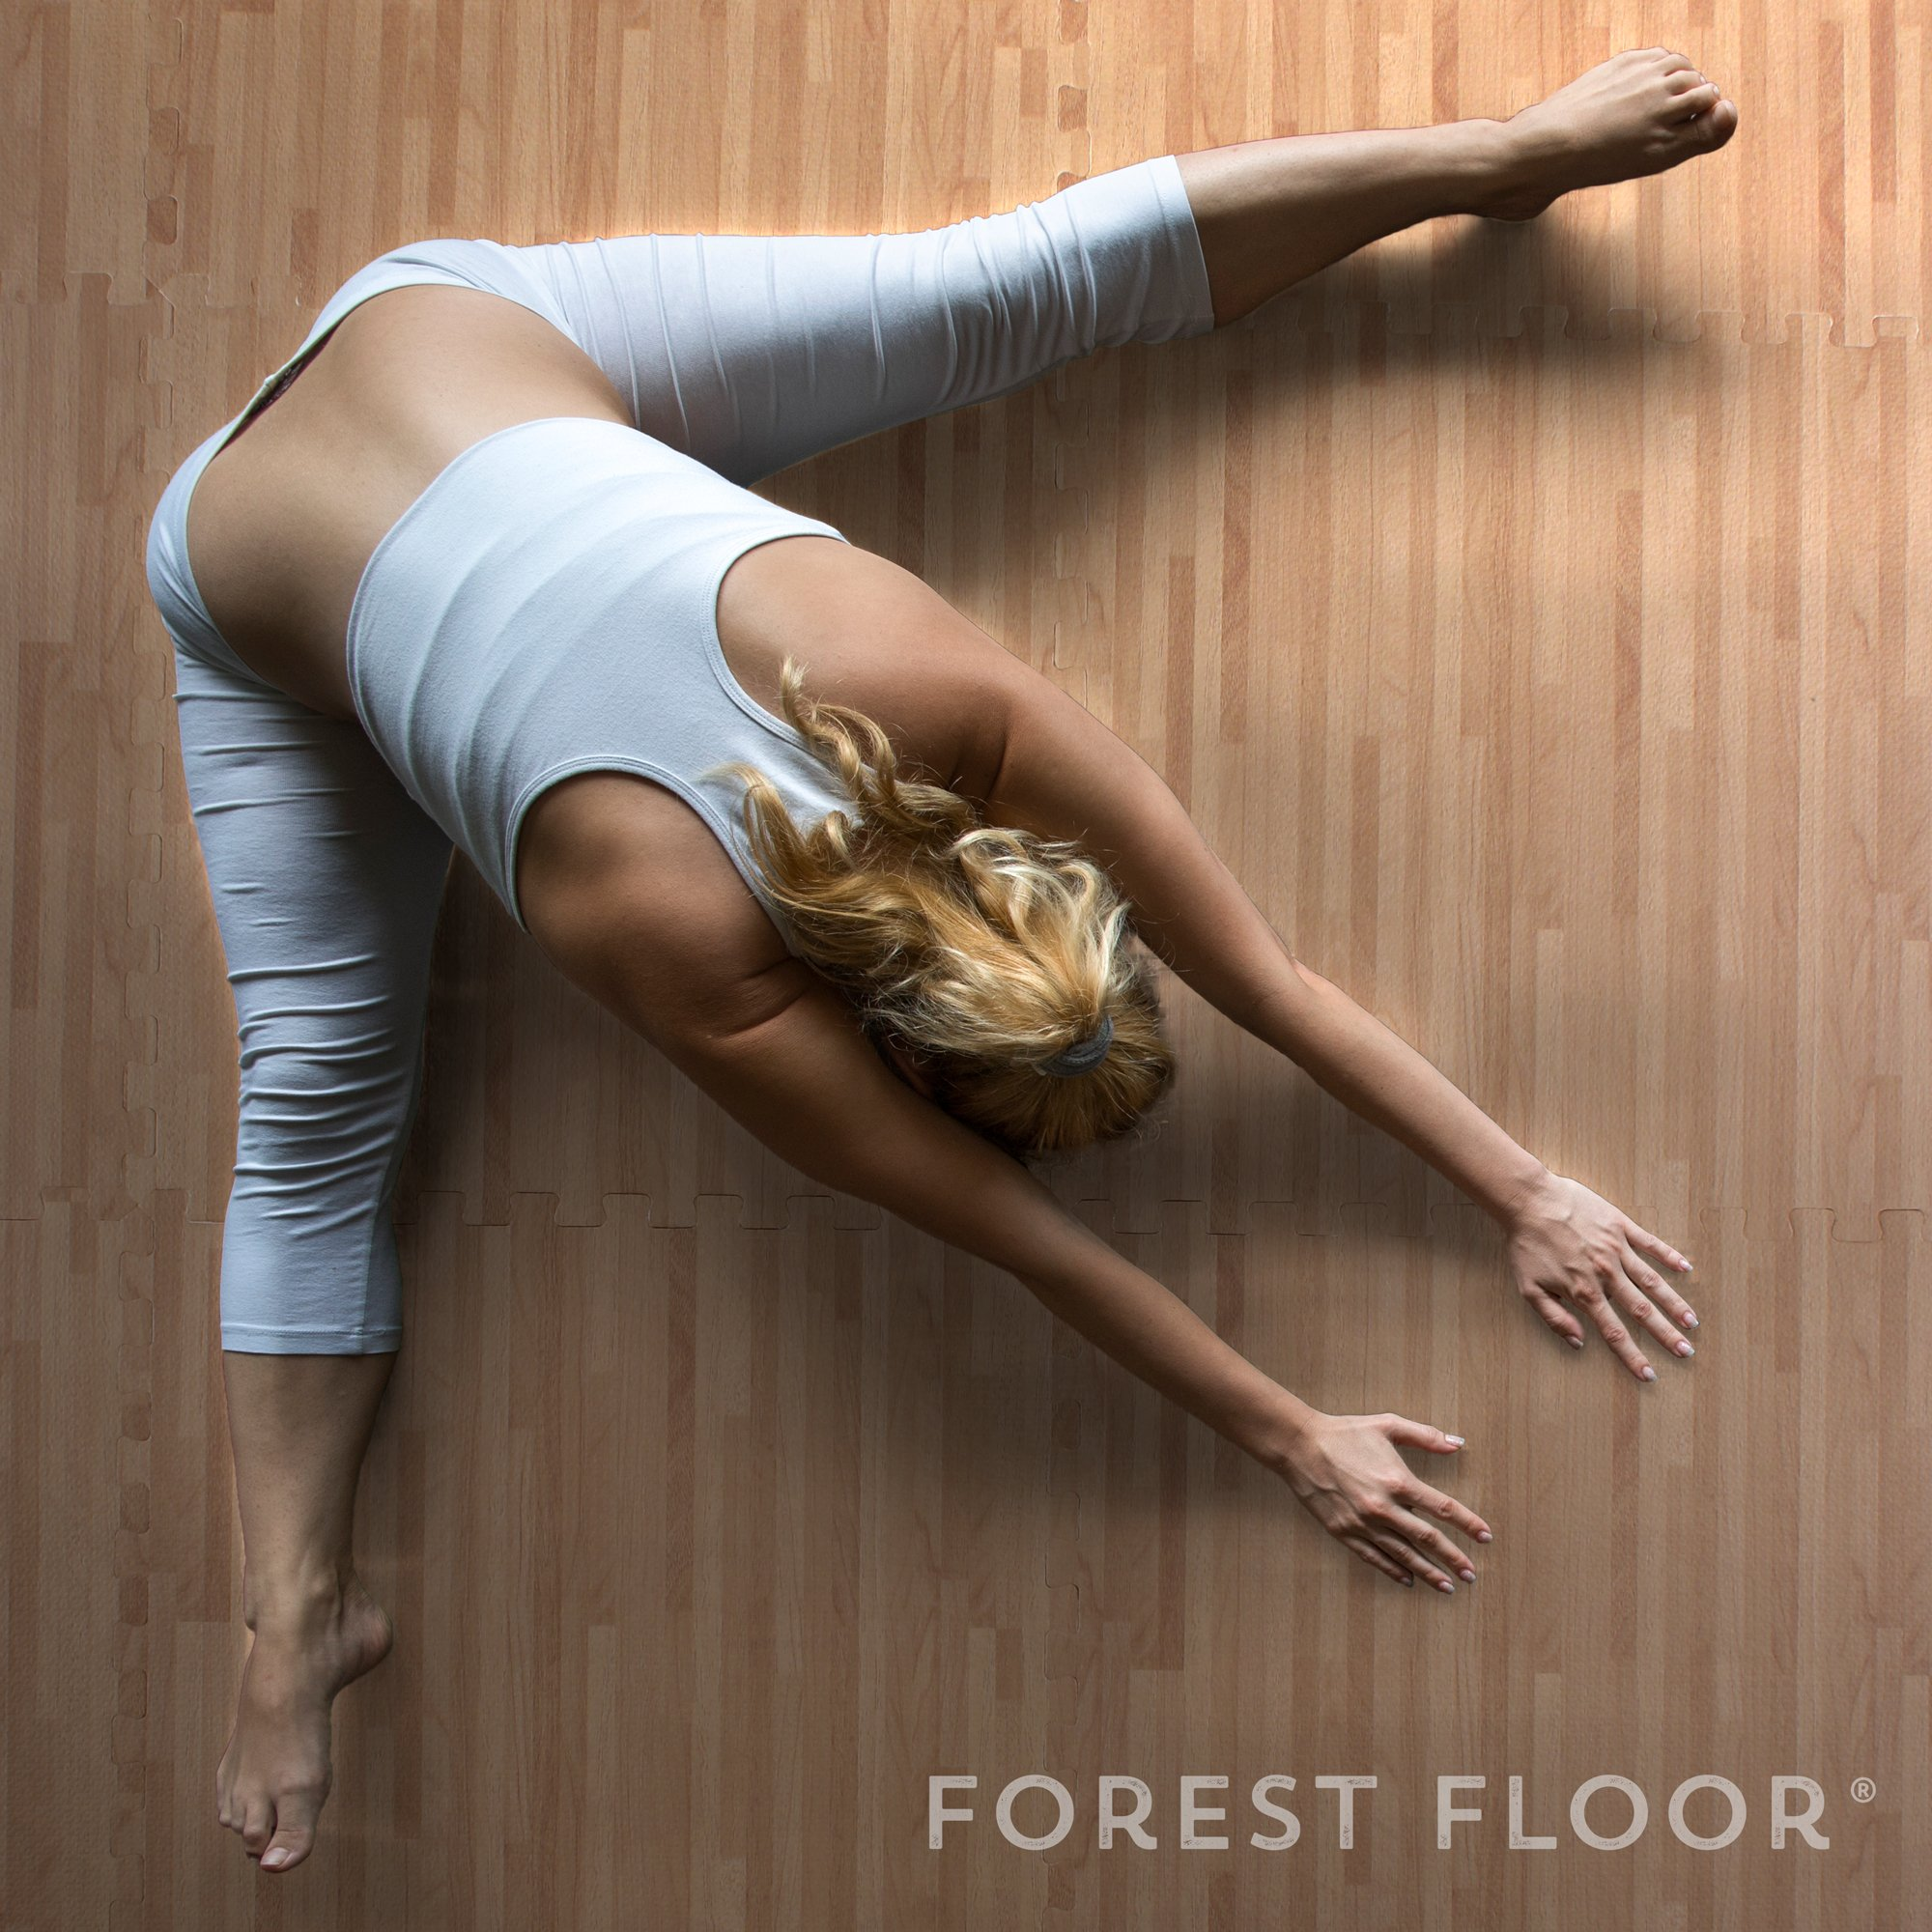 Forest Floor 3/8'' Thick Printed Wood Grain Interlocking Foam Floor Mats, 16 Sq Ft (4 Tiles), White Oak by Forest Floor (Image #7)